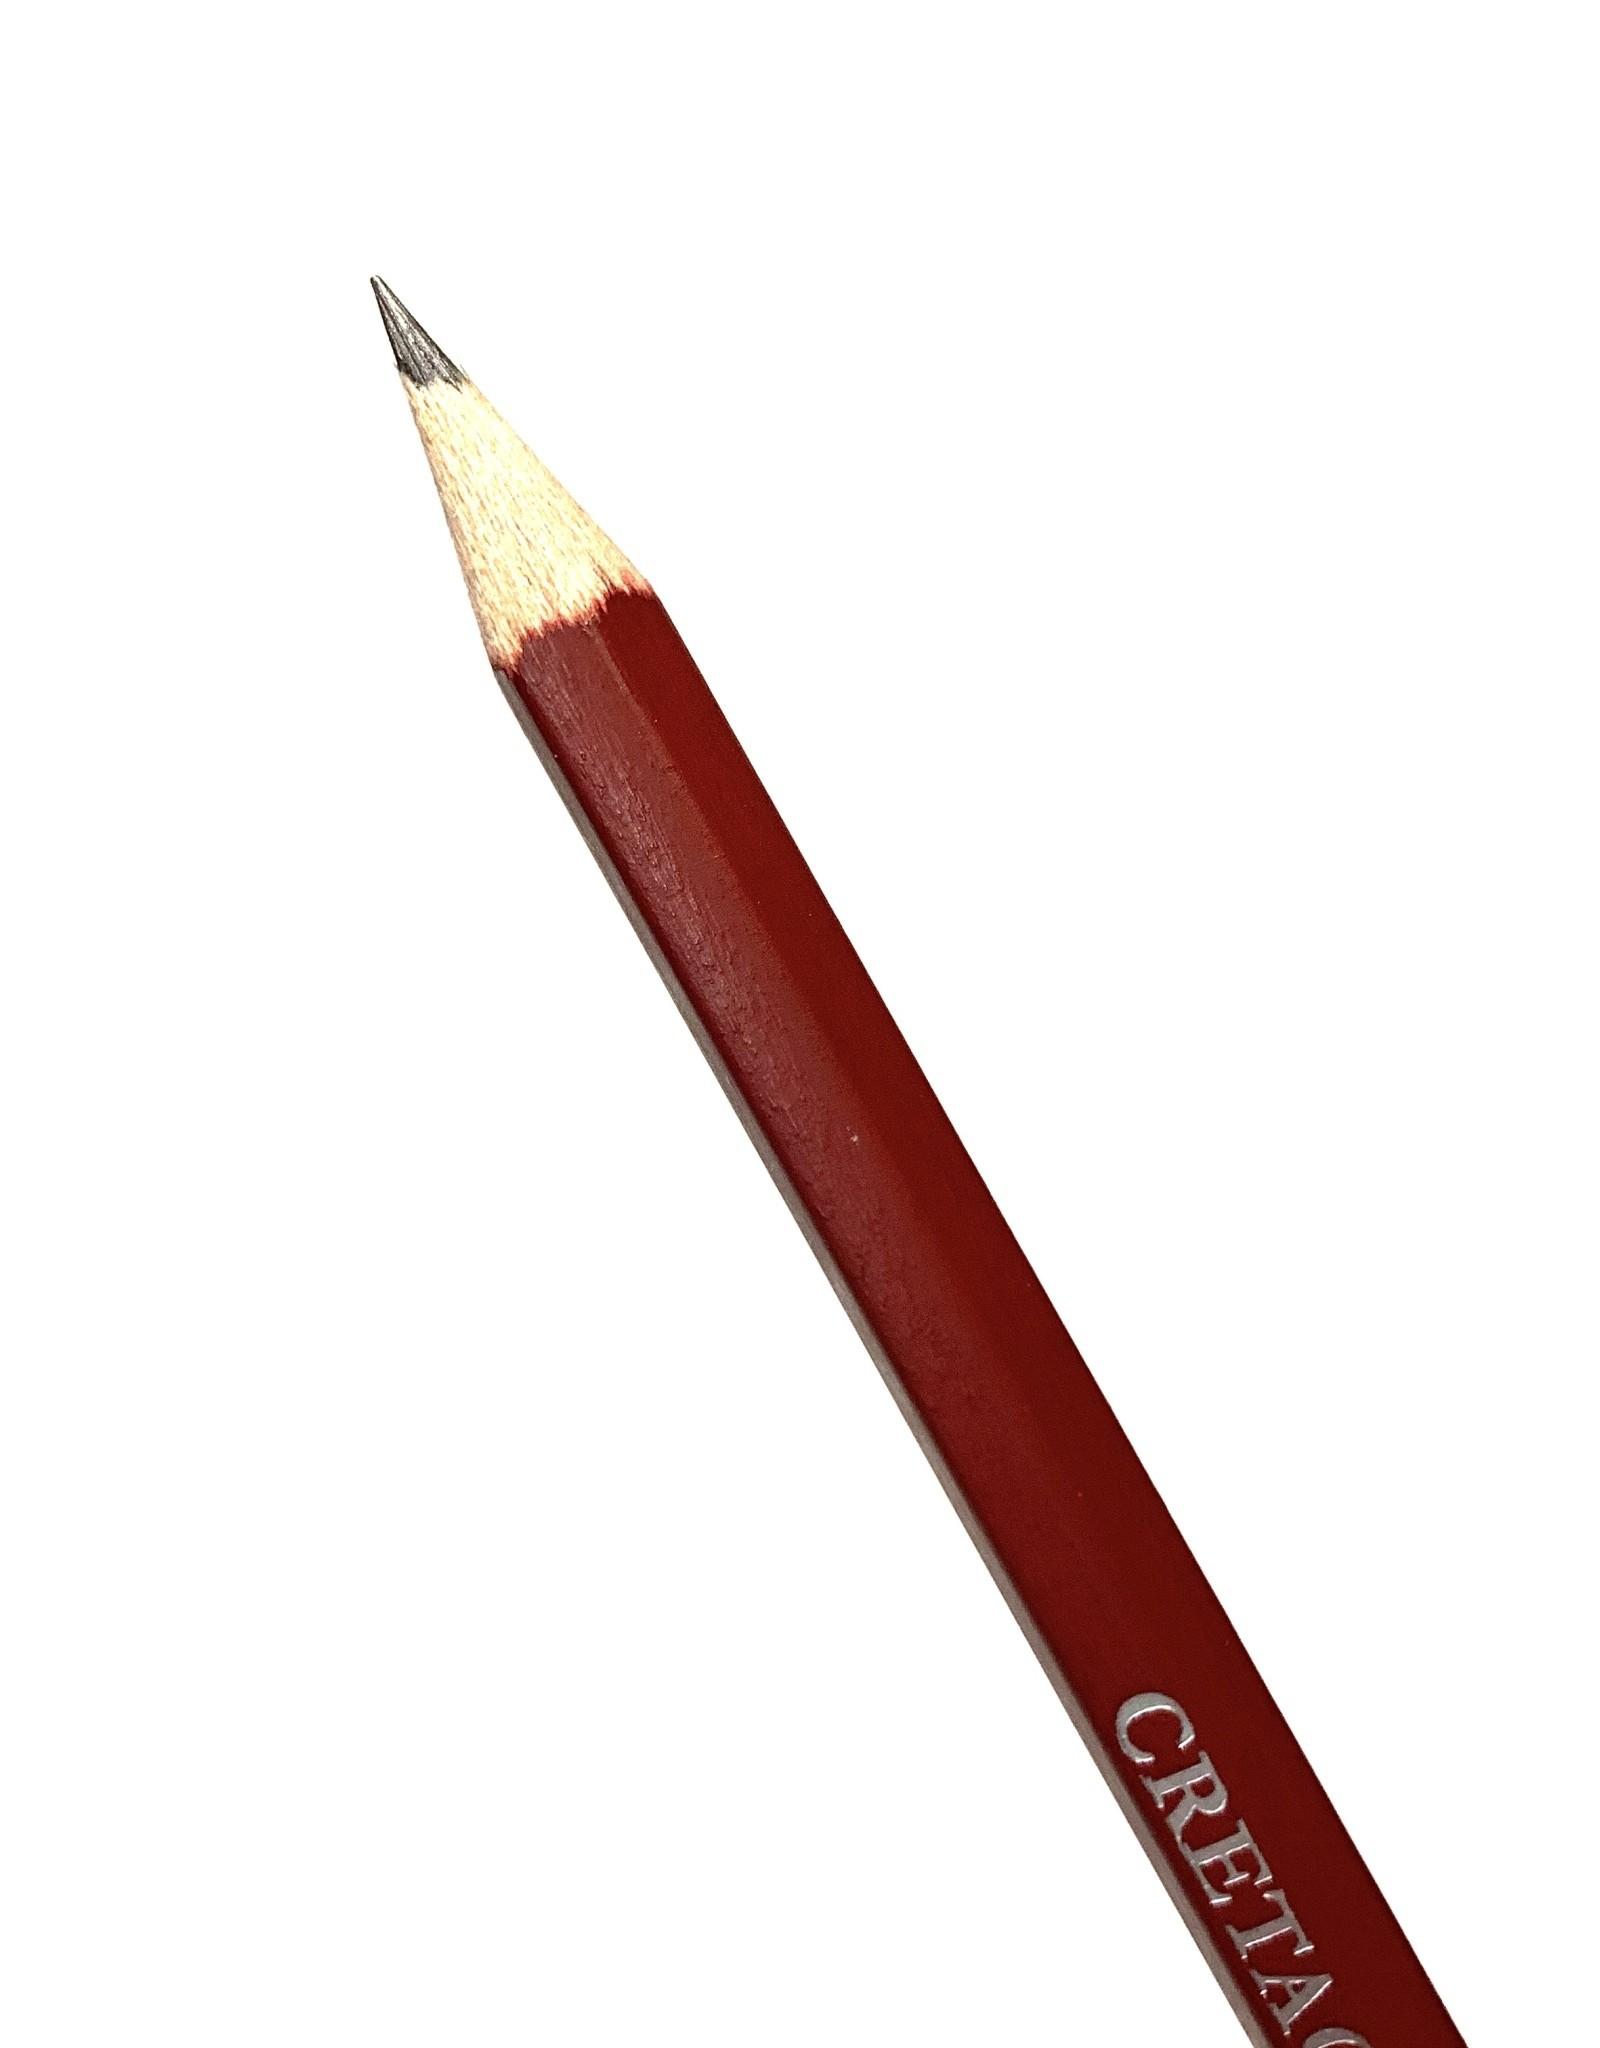 Cretacolor Graphite Pencil, HB